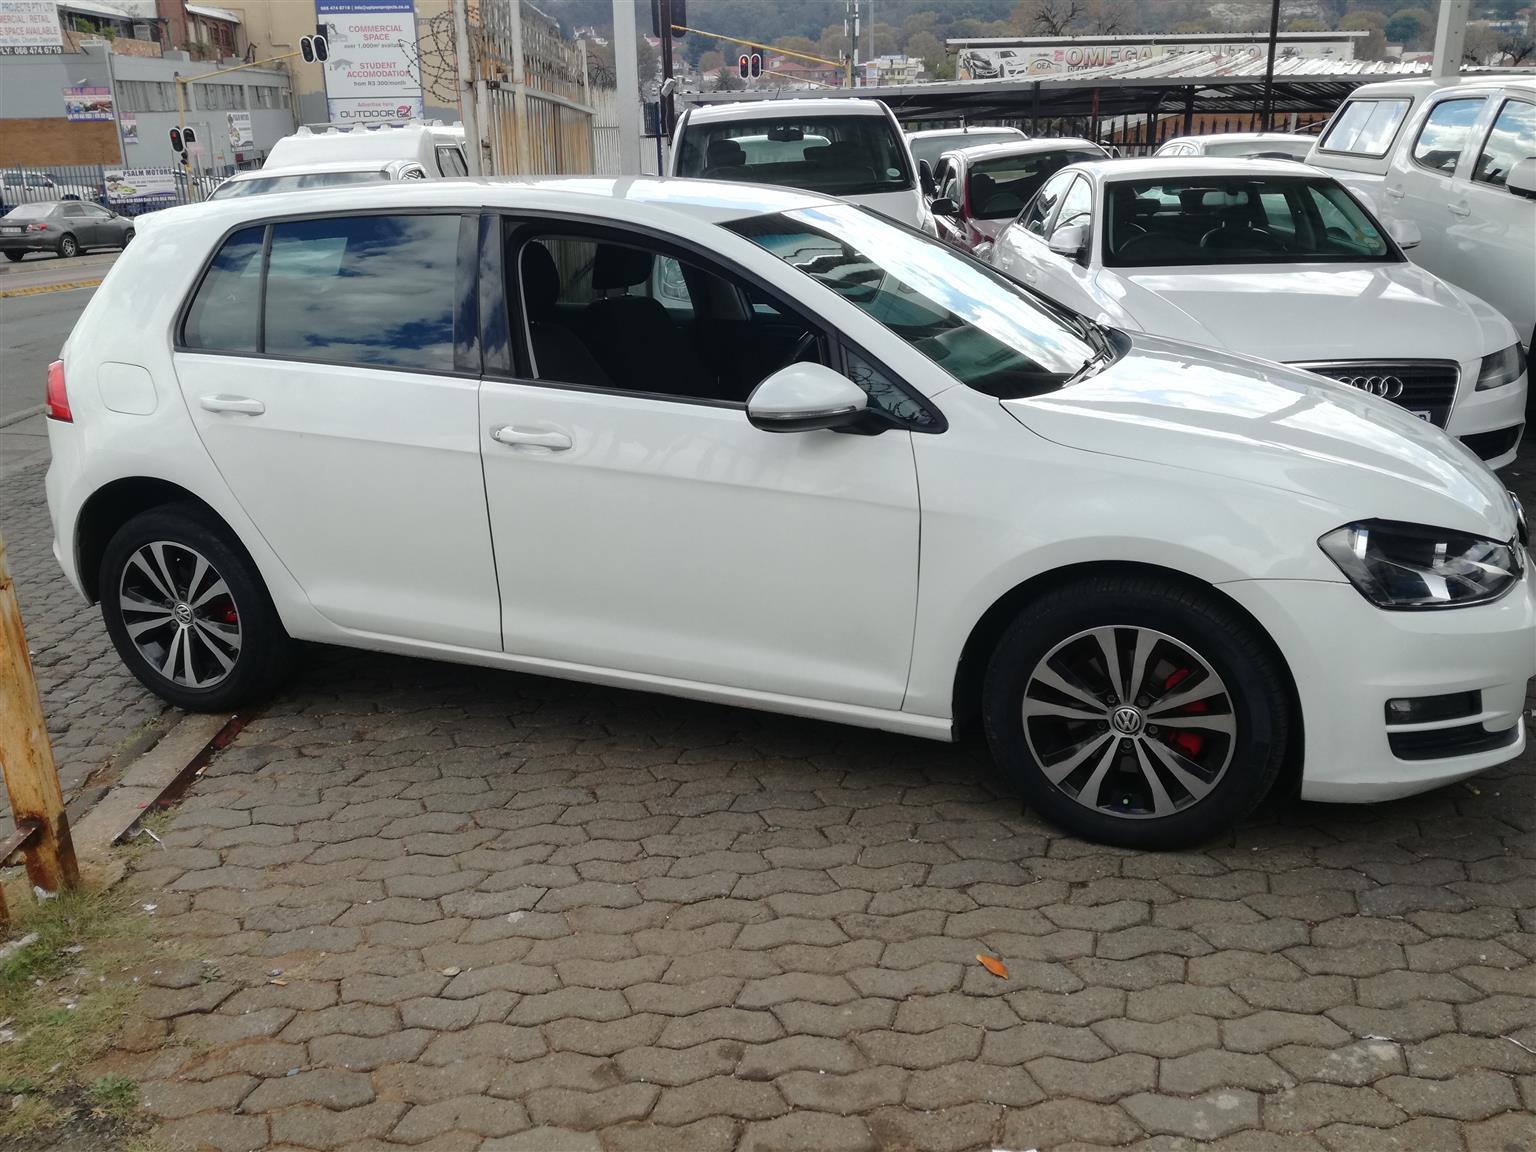 Volkswagen Golf Vii 1.4 TSI 2013  Model